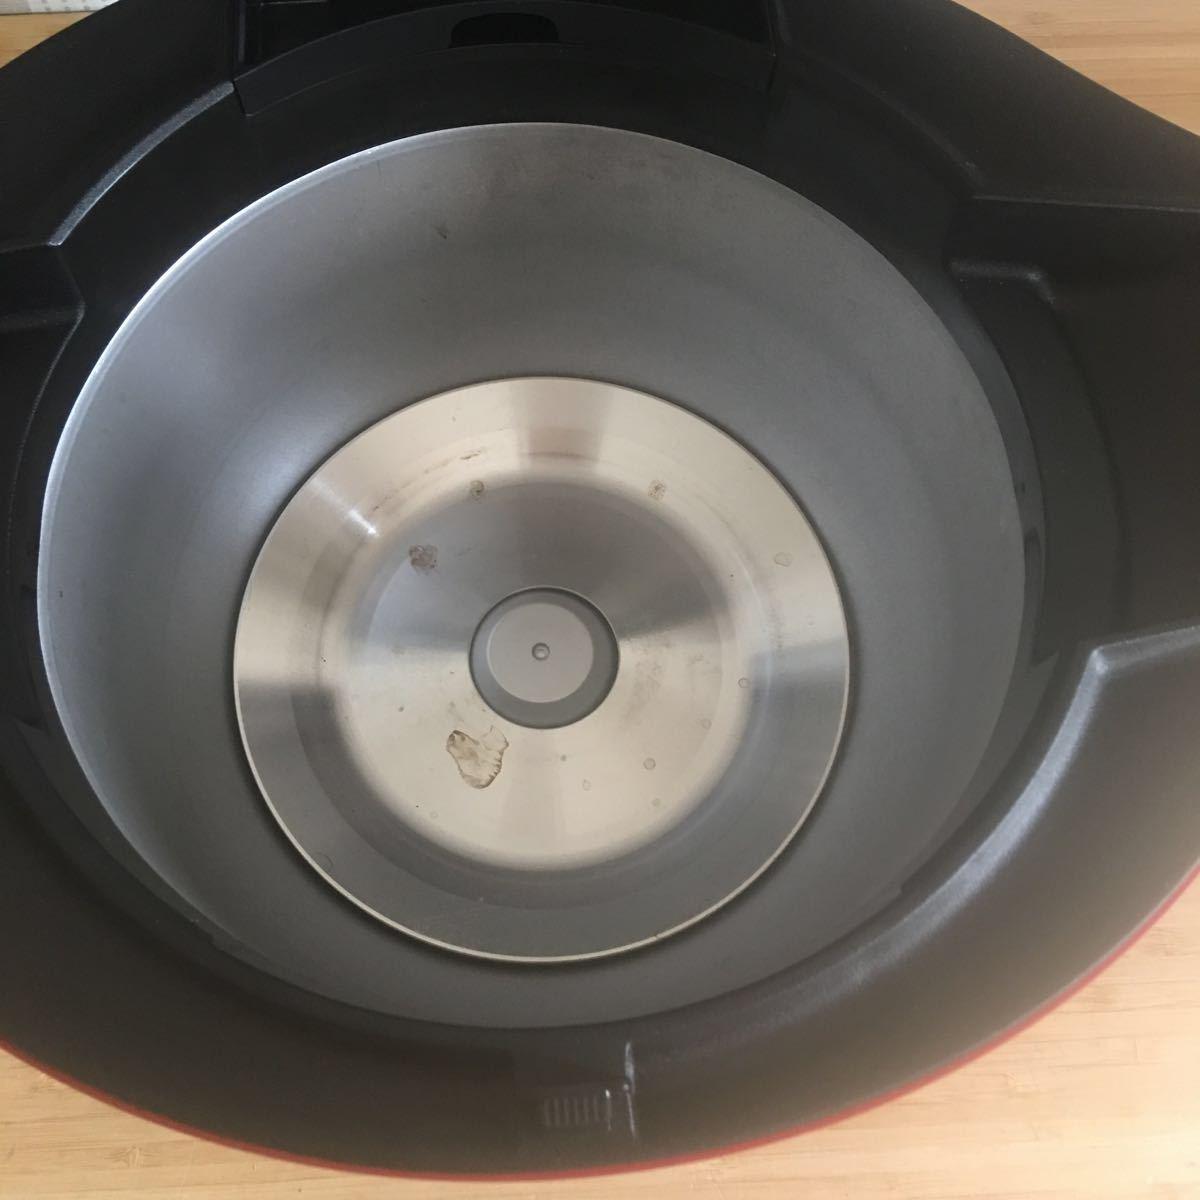 【B4】1円スタート!【動作確認済】SHARP シャープ HEALSIO ヘルシオ ホットクック KN-HW24C-R 水なし自動調理鍋 2018年製 レッド 無線LAN_画像6